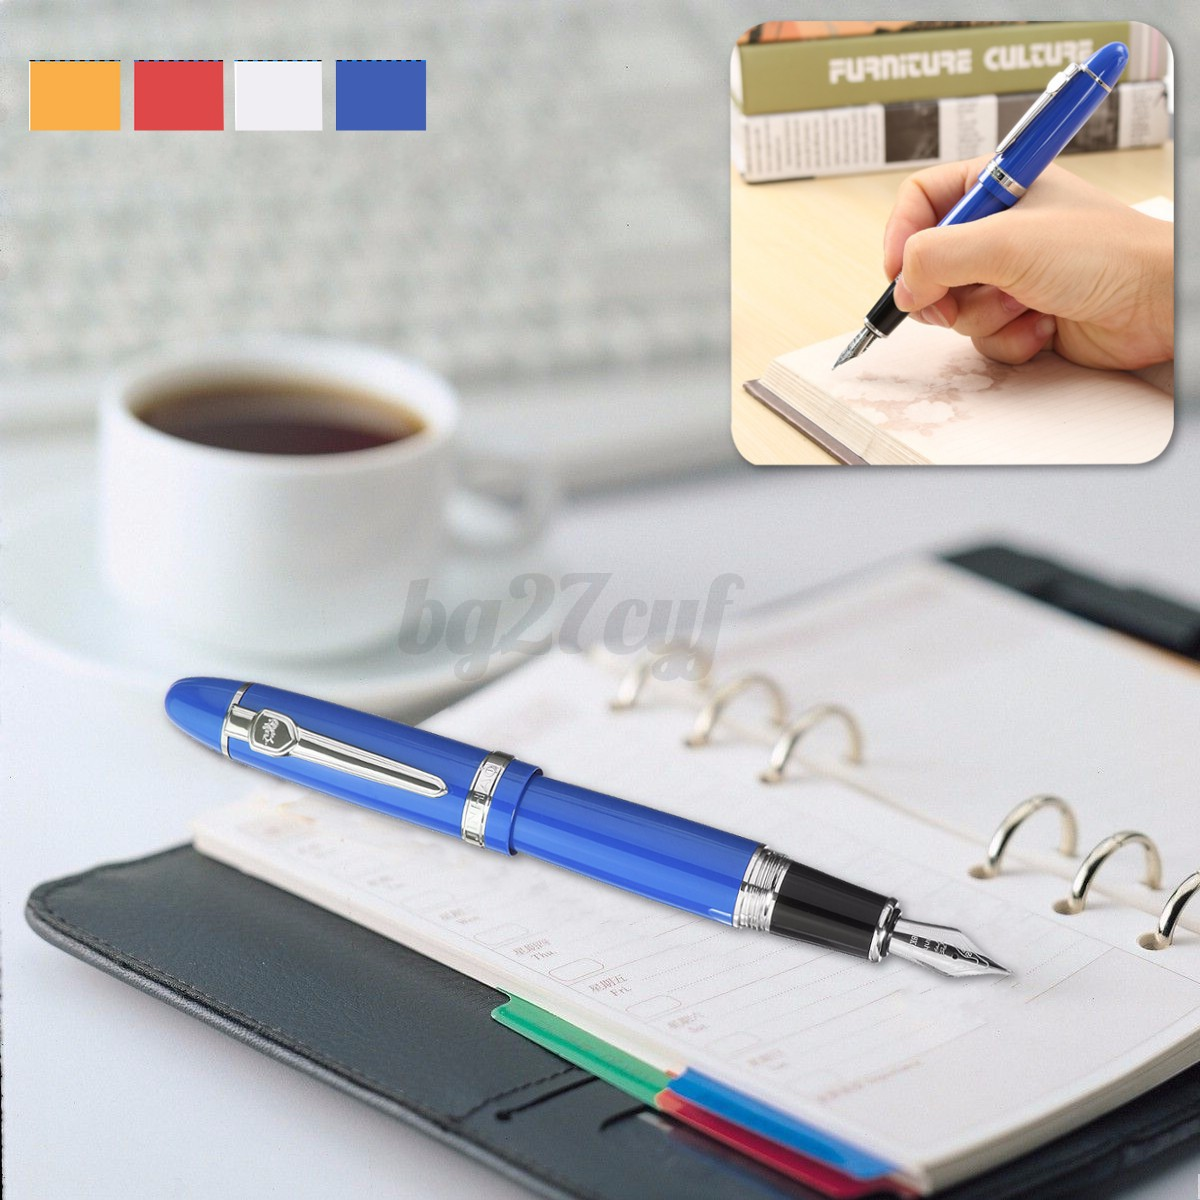 JINHAO-159-Frosted-Medium-Nib-Fountain-Pen-School-Office-Writing-Clip-Gift-Metal